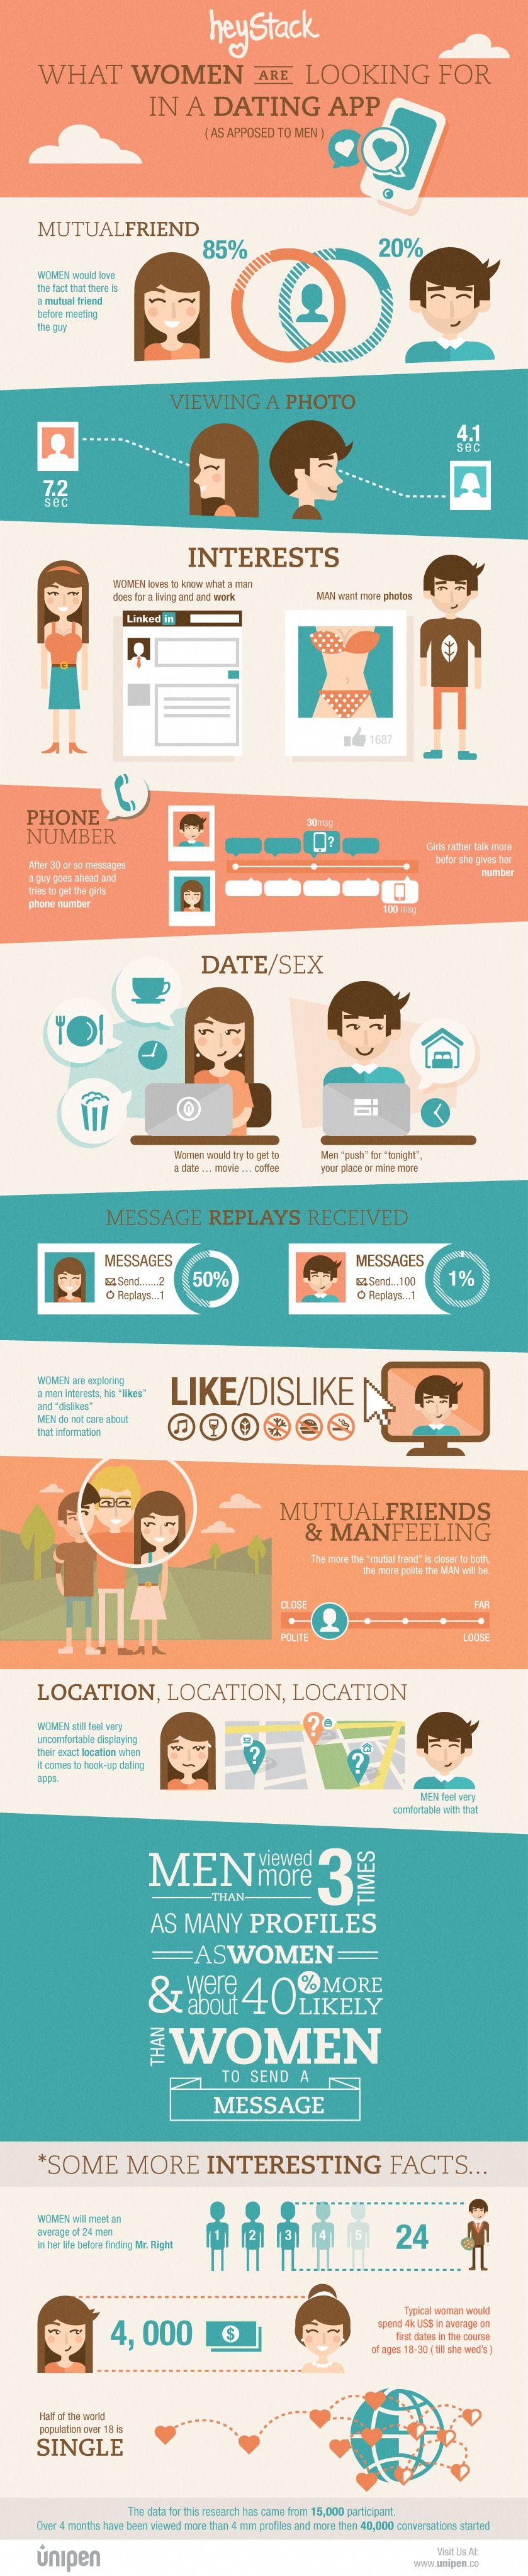 top aplicatii dating pčinja femei pe bancnote